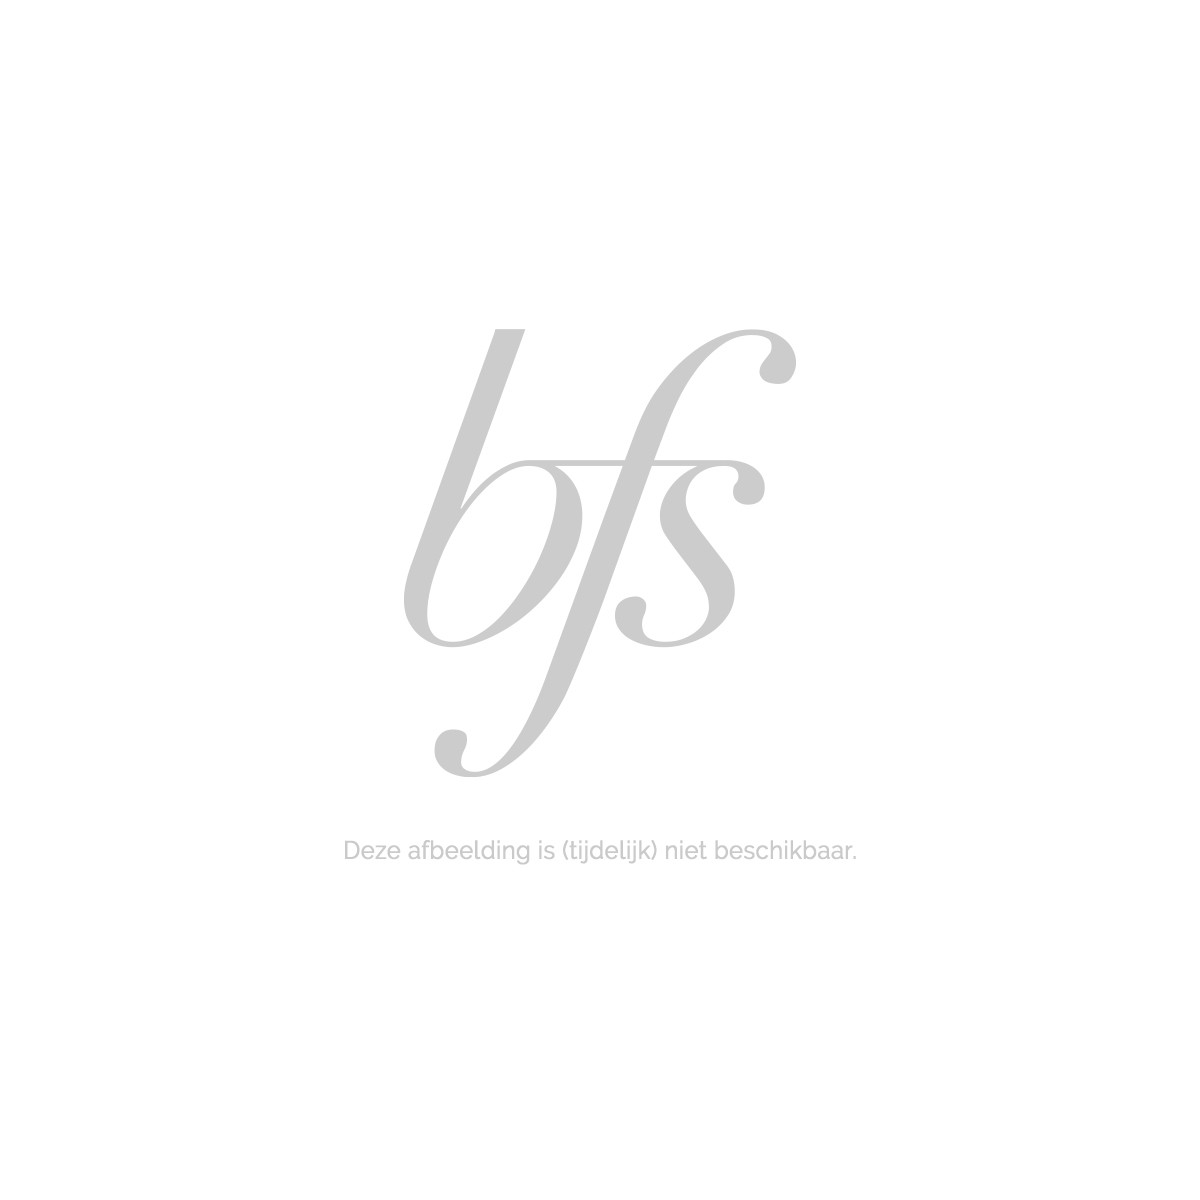 Michael Kors Sparkling Blush Eau De Parfum Spray 30 Ml